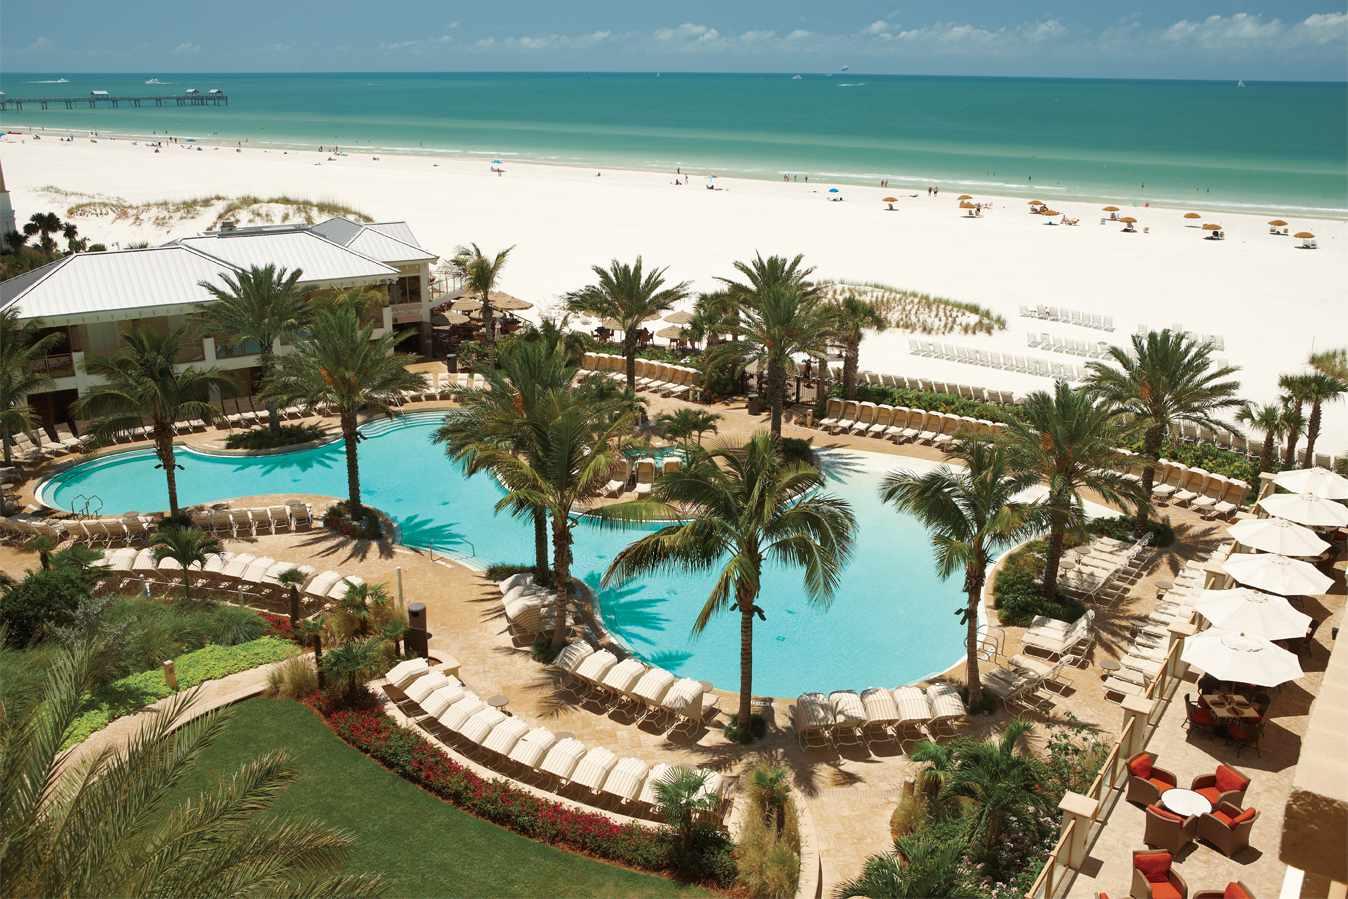 Regreats de yoga - Sandpearl Resort